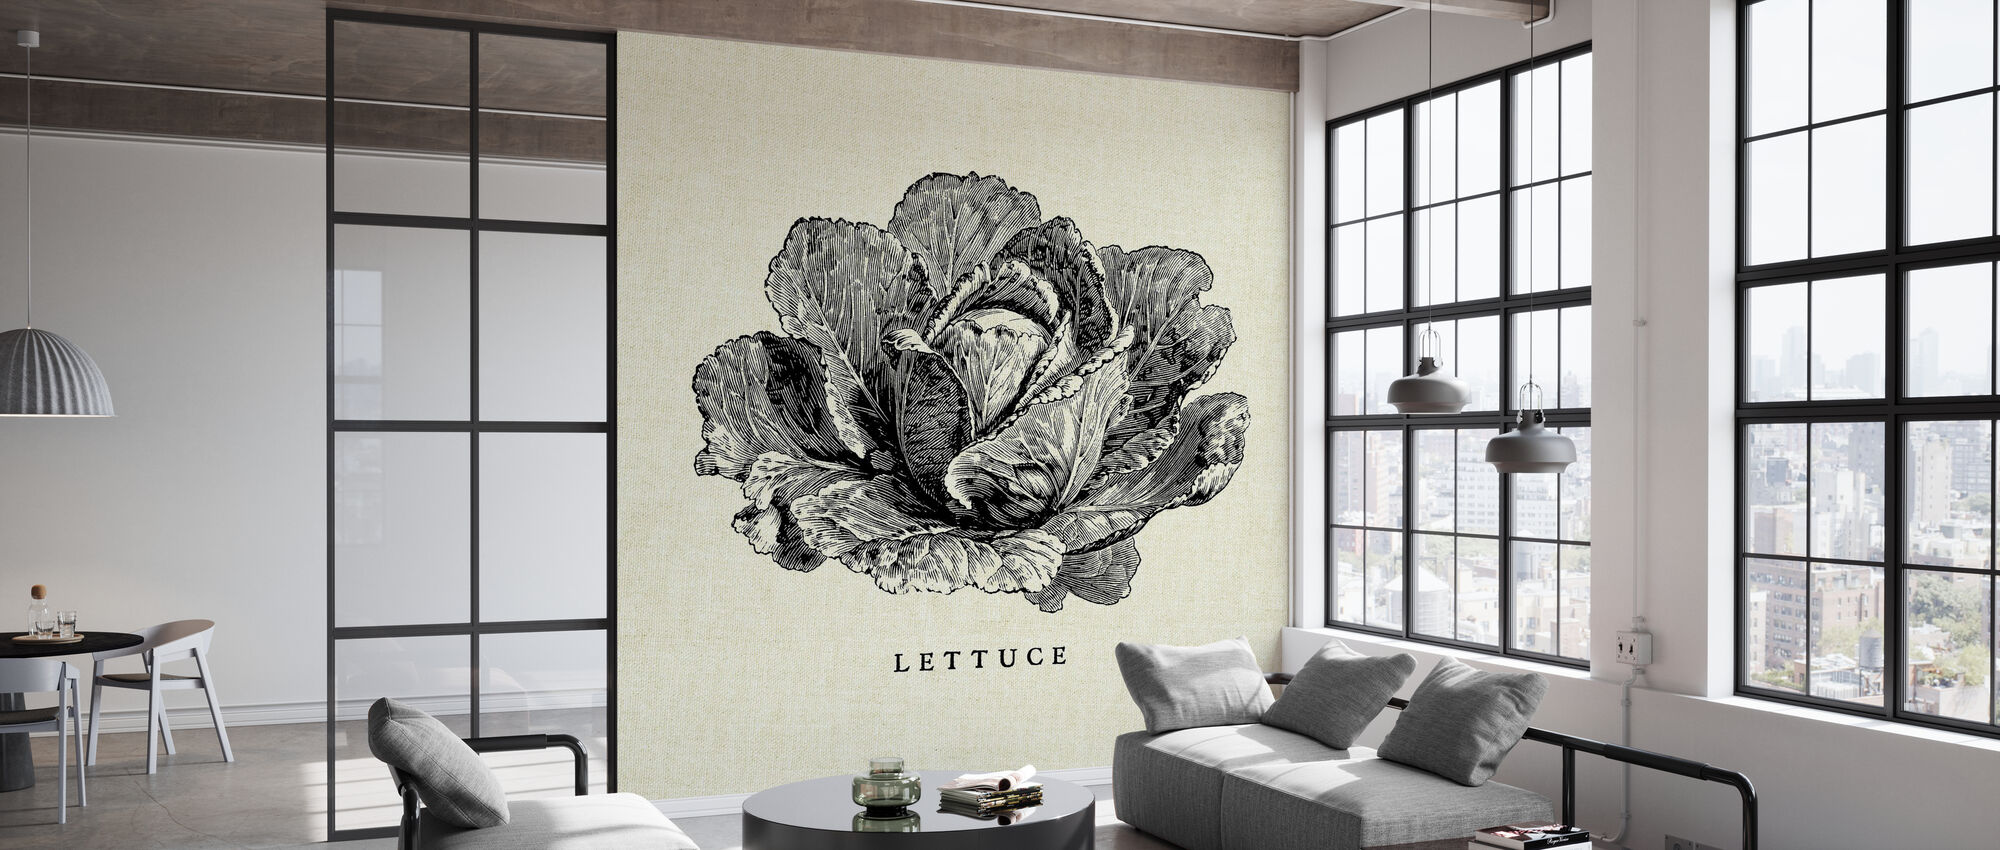 Kitchen Illustration - Lettuce - Wallpaper - Office